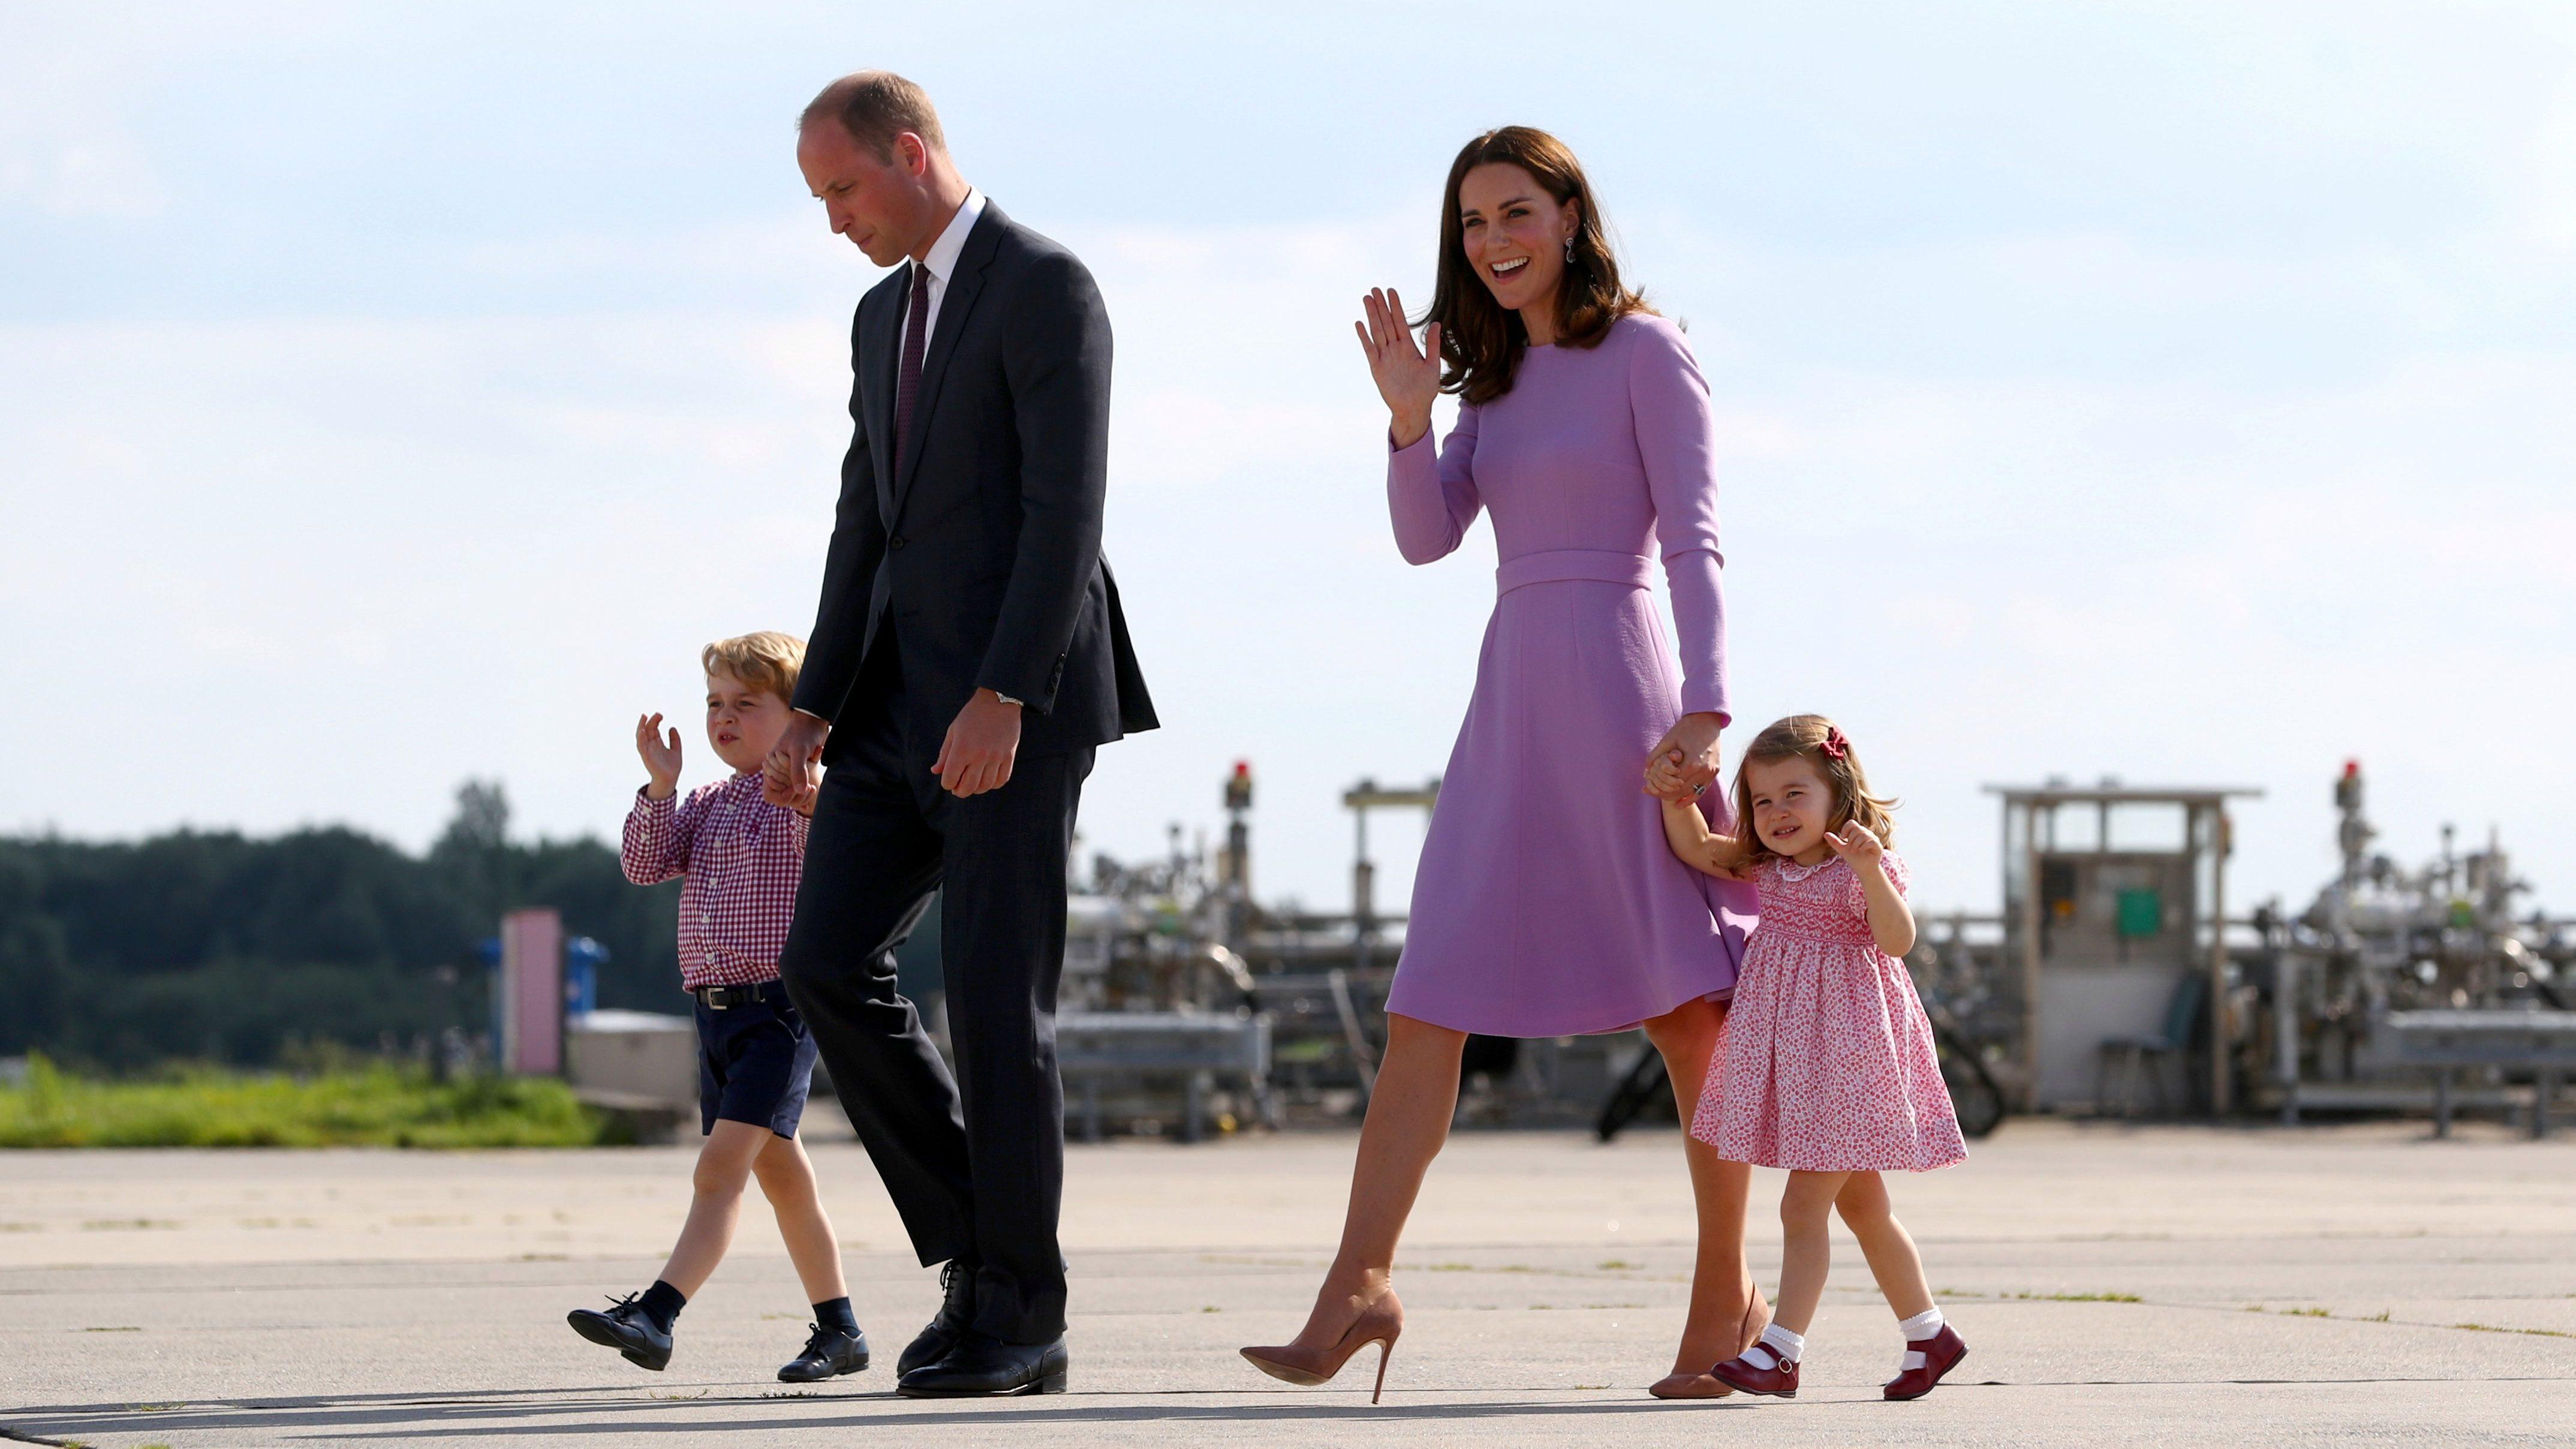 Britain's Prince William and his wife Catherine, Duchess of Cambridge leave Hamburg